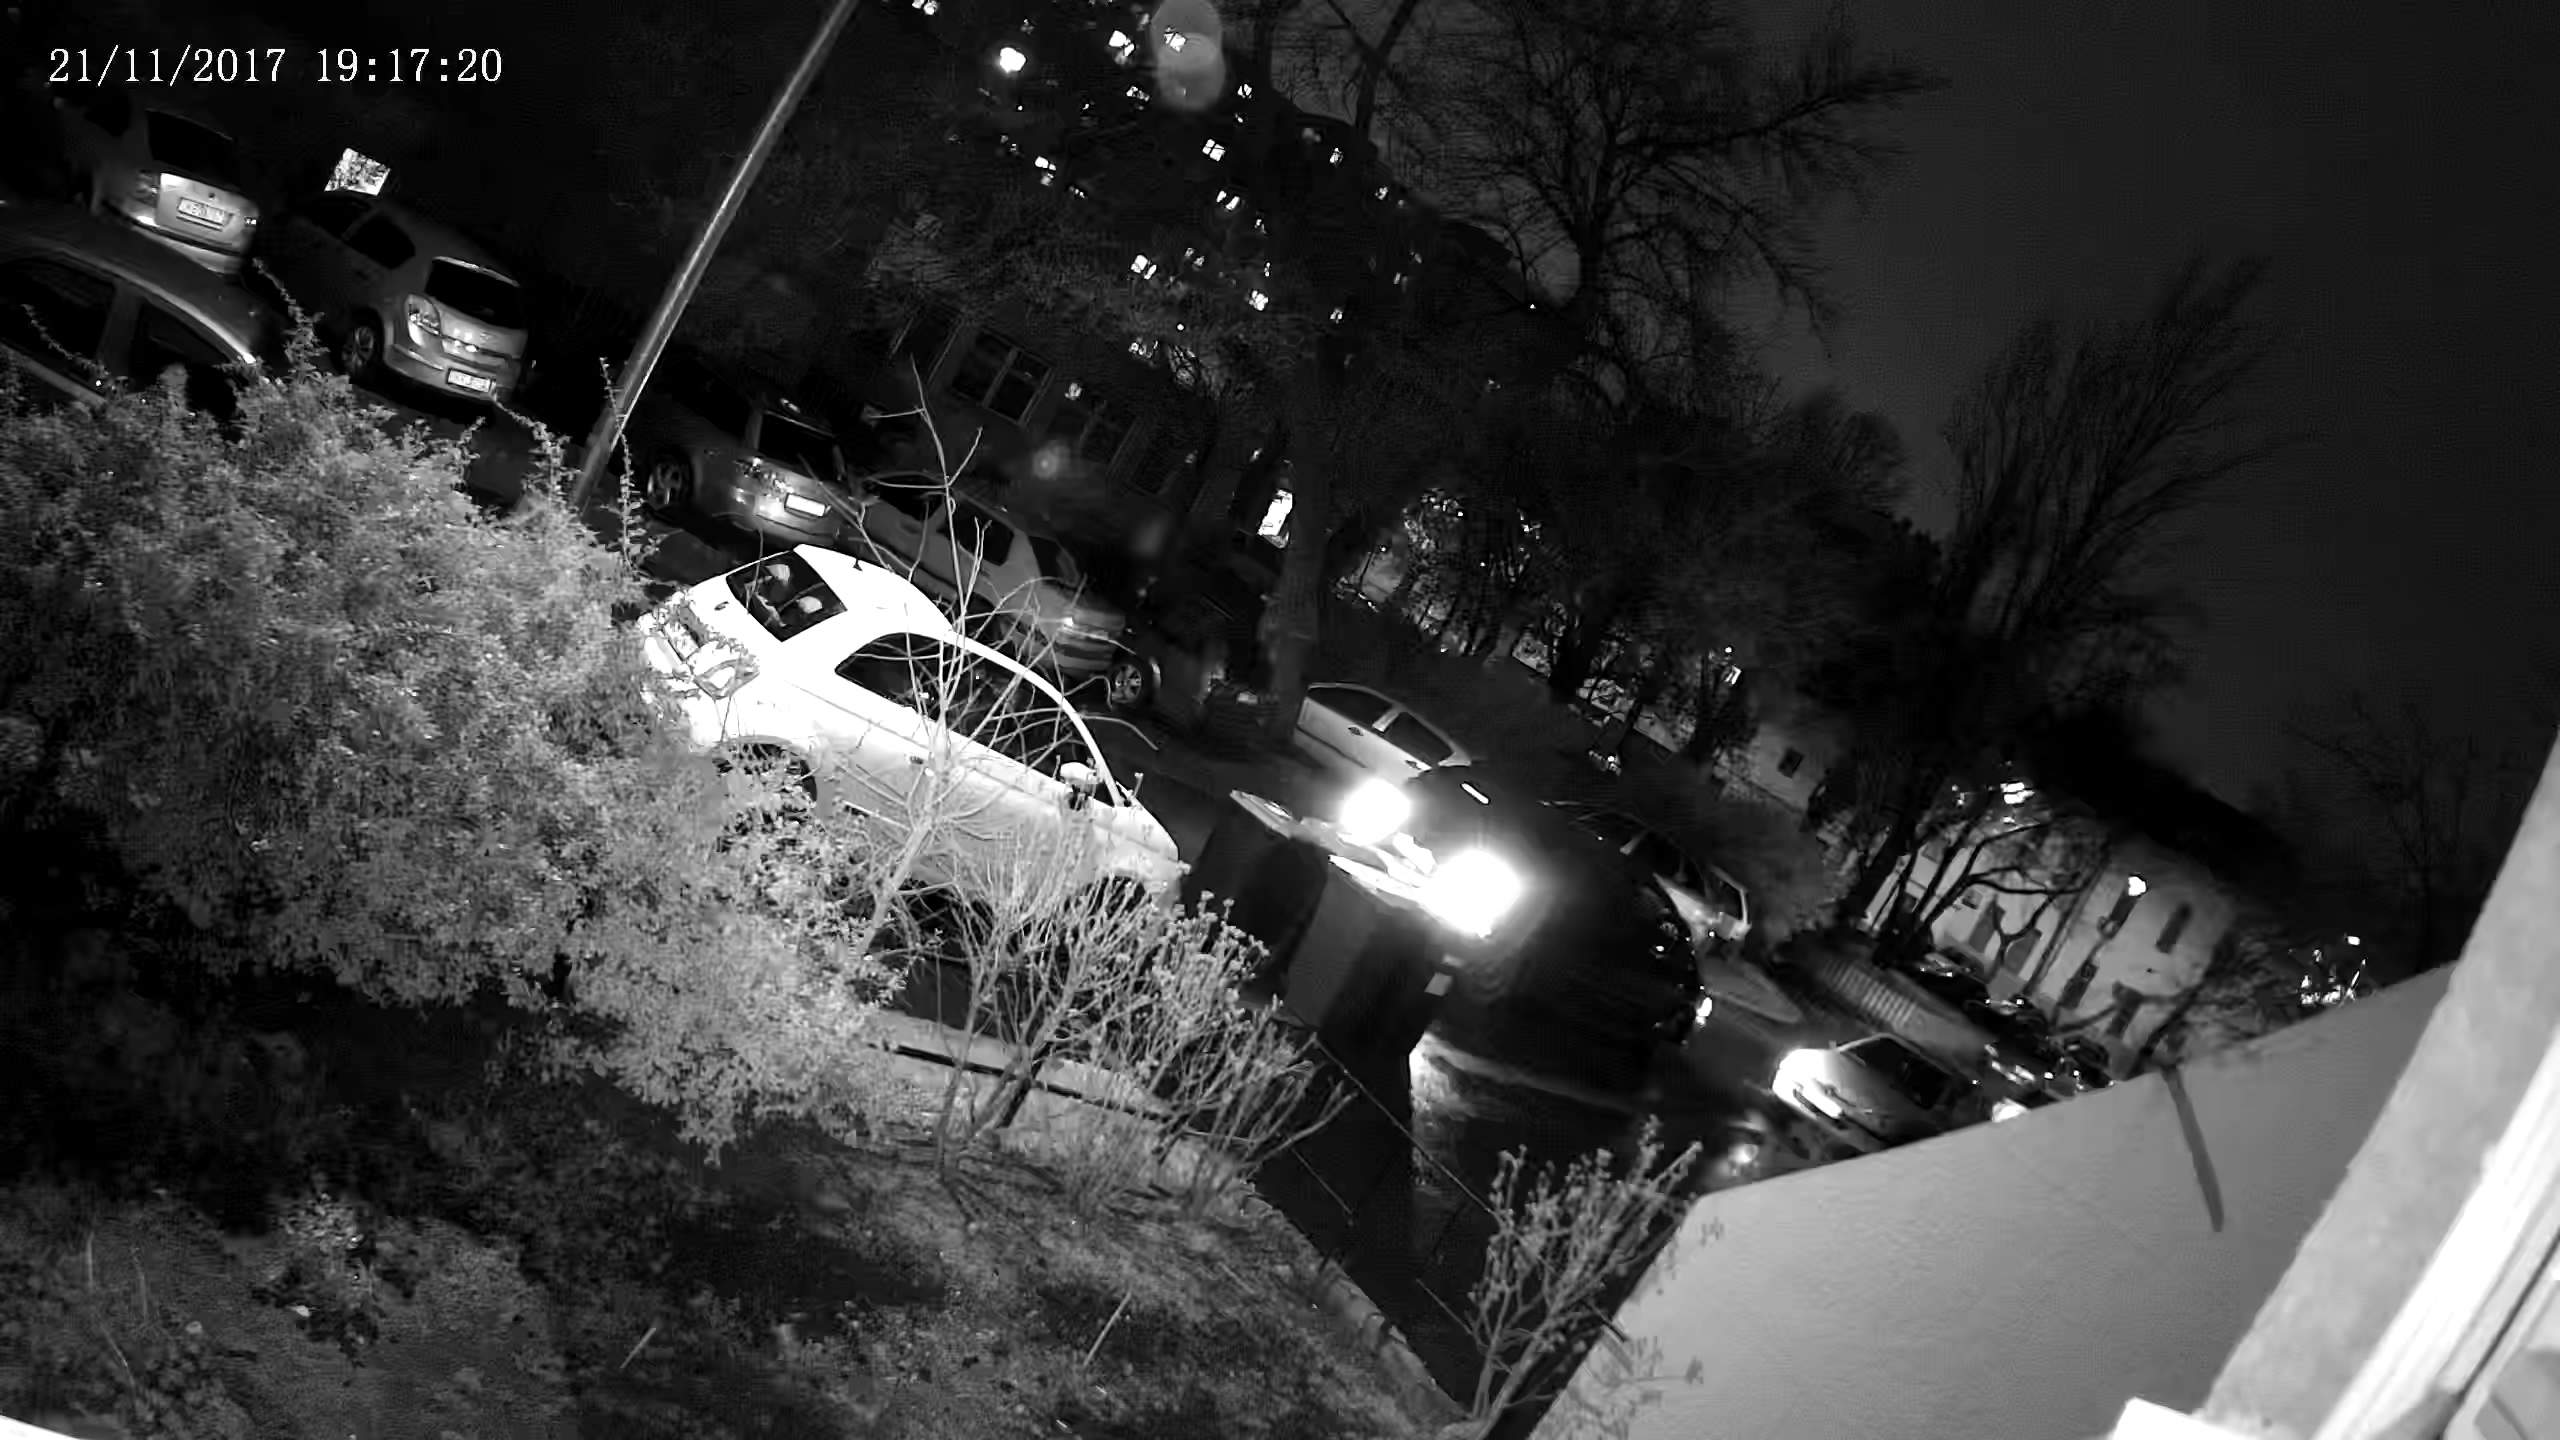 Videosec IPD-3634-28Z Este kint, fekete-fehér